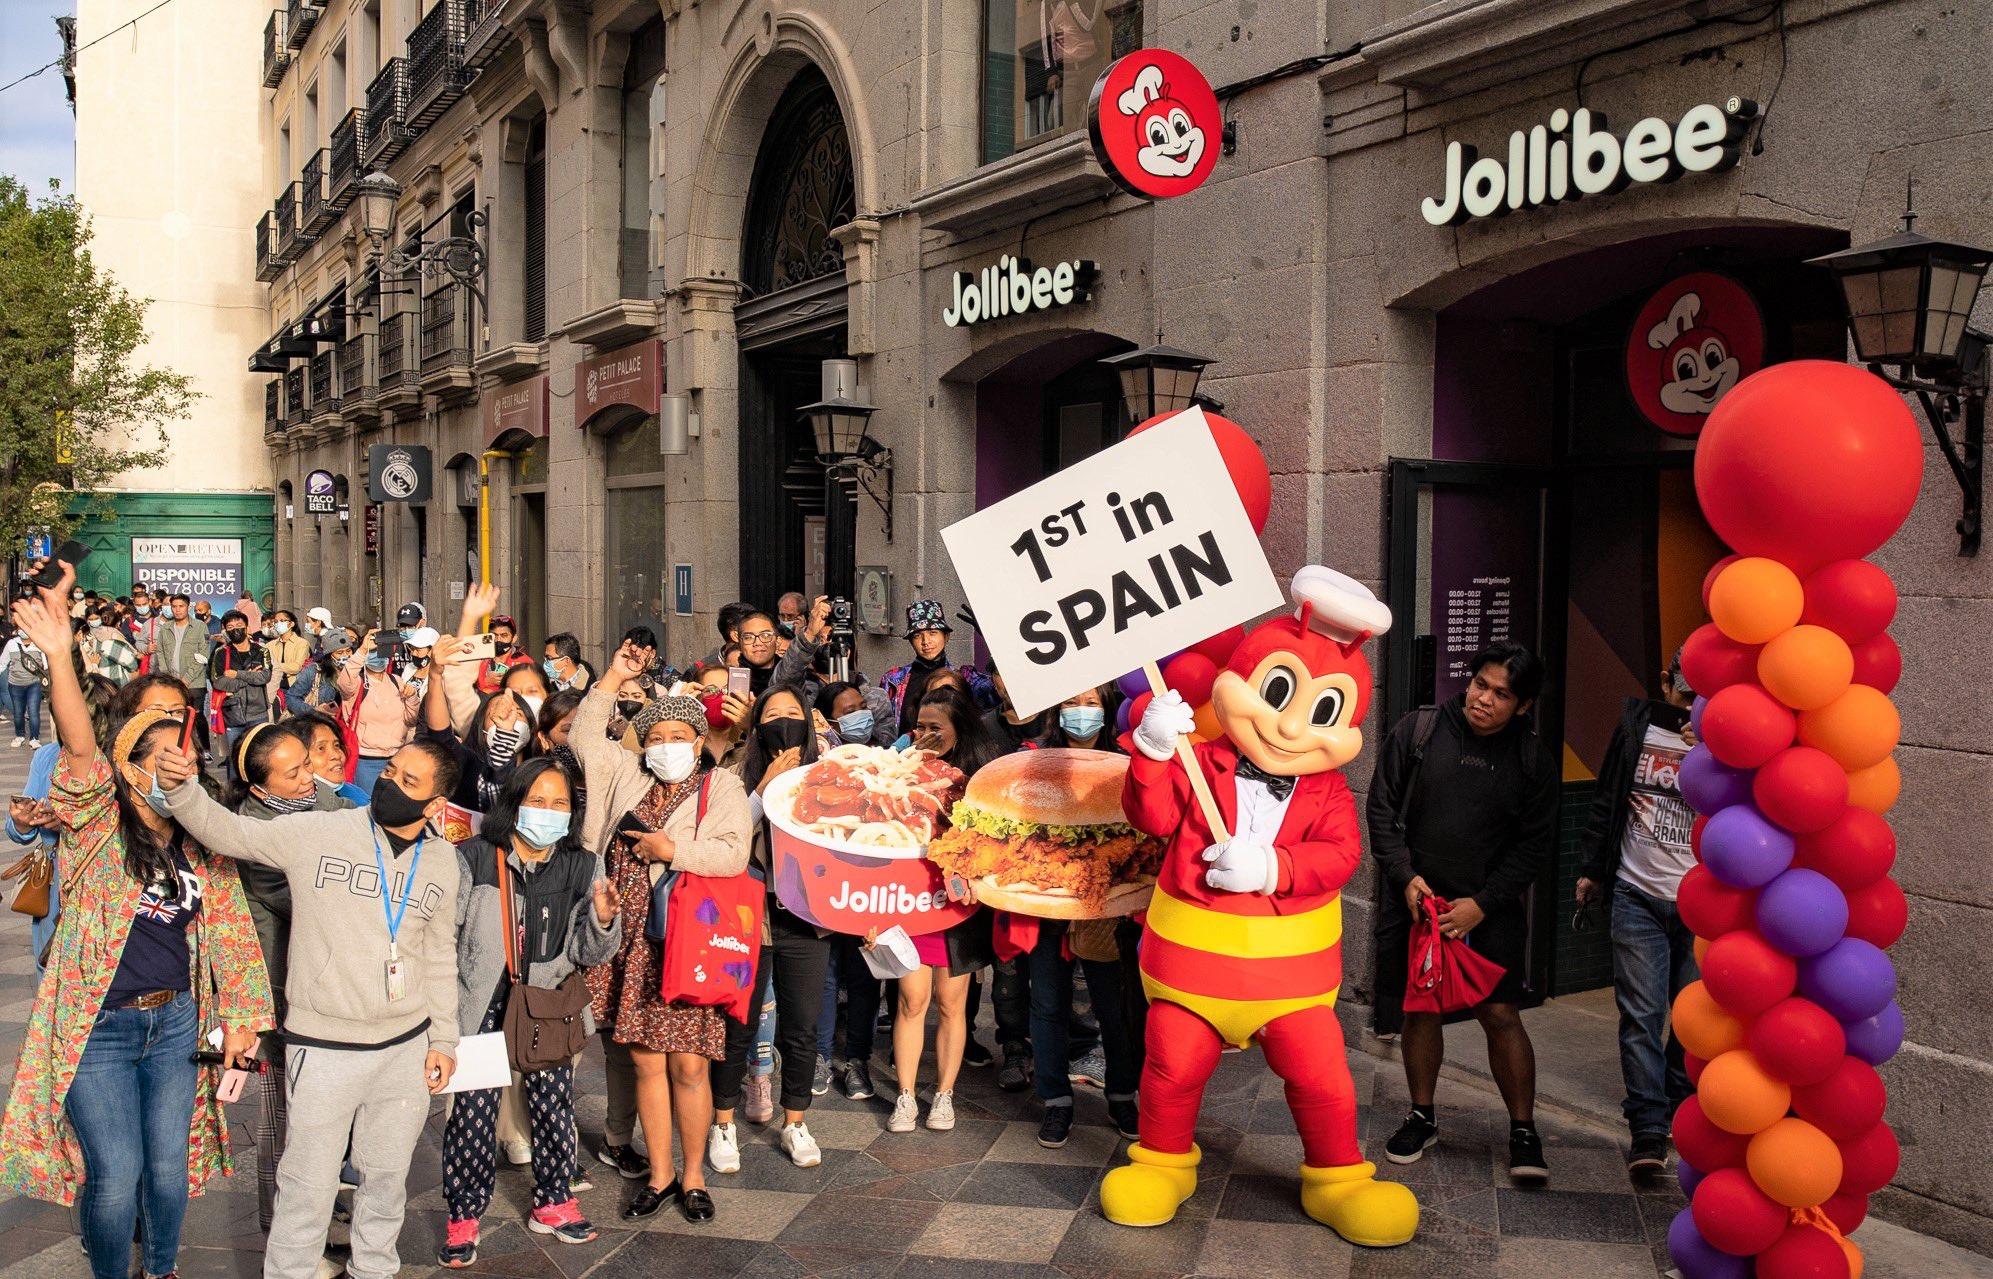 jollibee, <b> Jollibee opened in Spain and the Internet made colonization jokes </b>